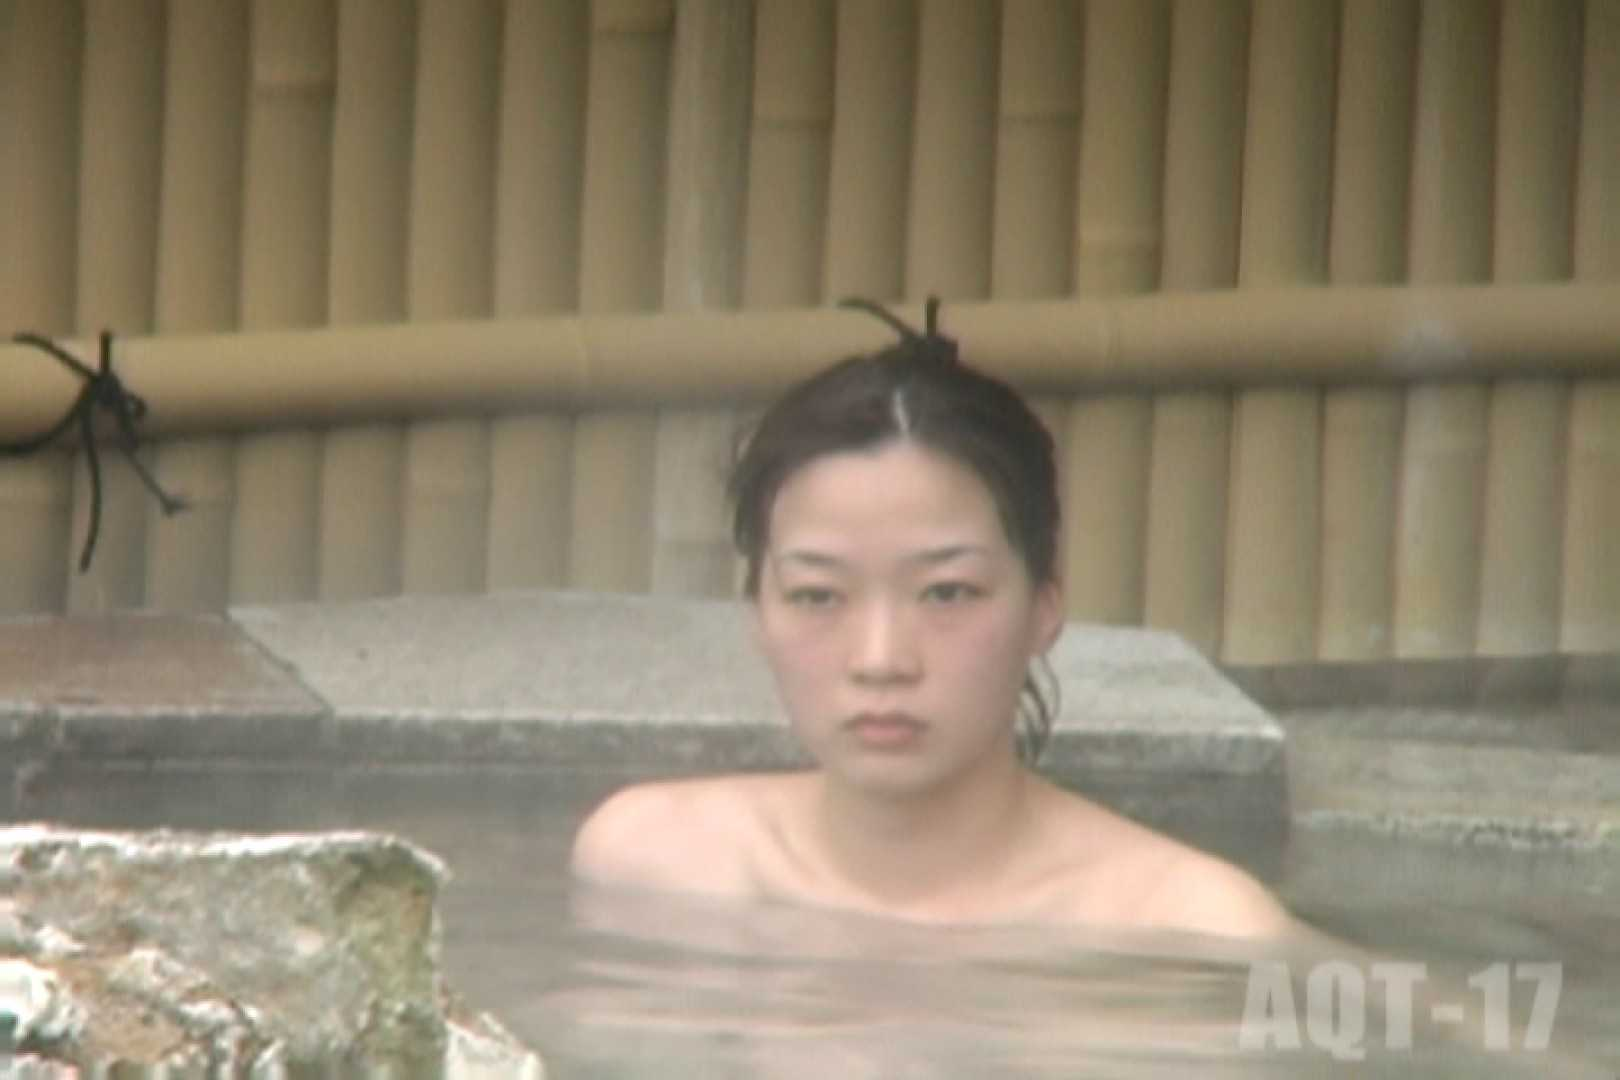 Aquaな露天風呂Vol.848 露天風呂突入 セックス画像 86pic 2